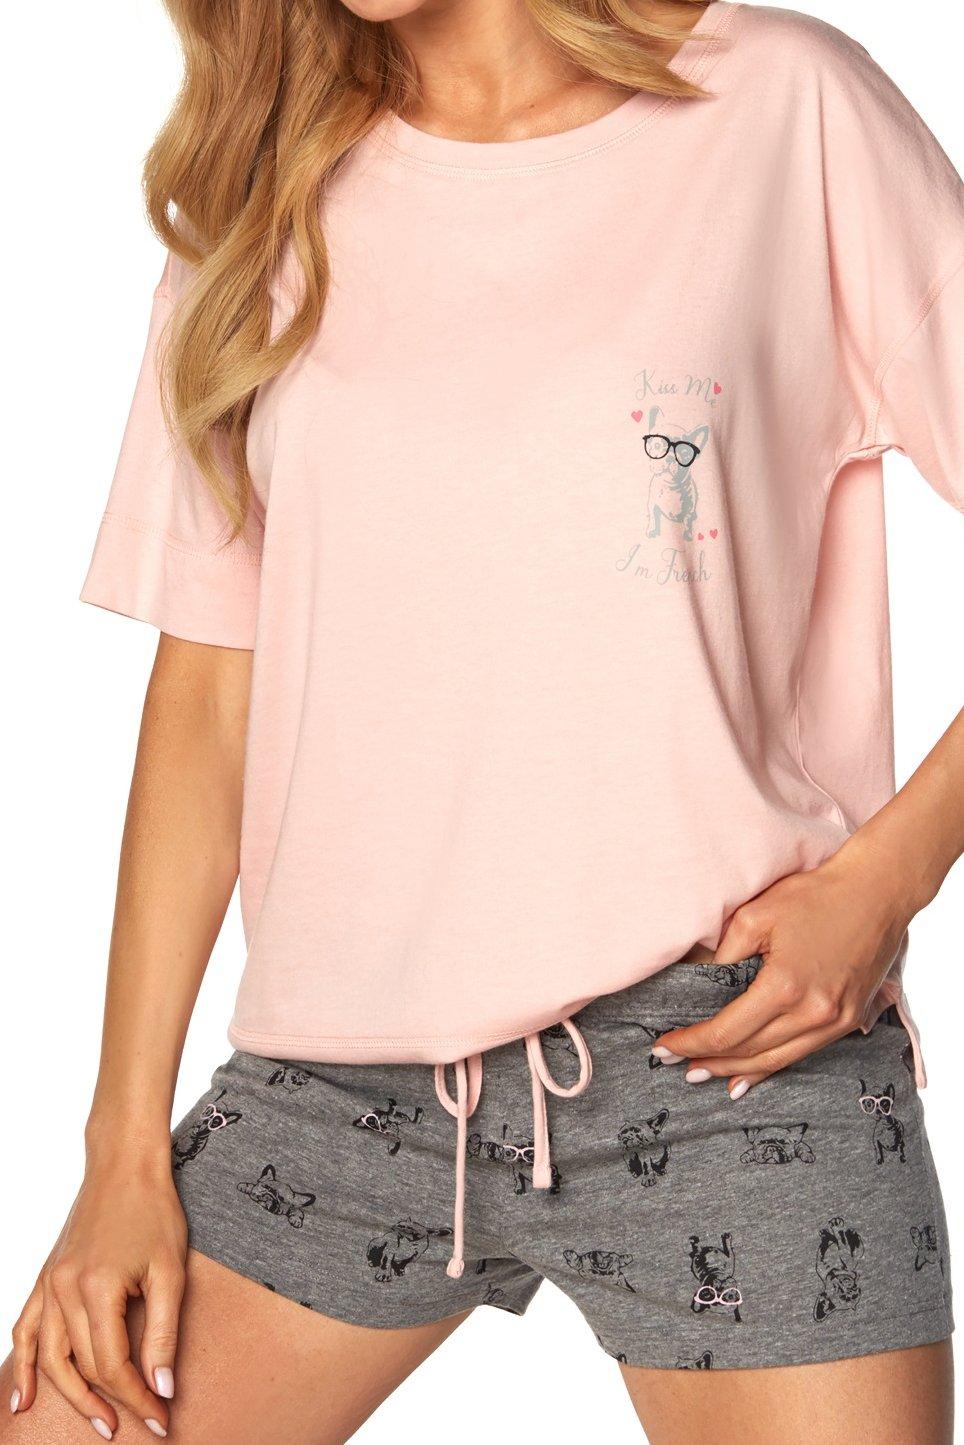 Monica SAL-PY-1168-II Pink-PIN